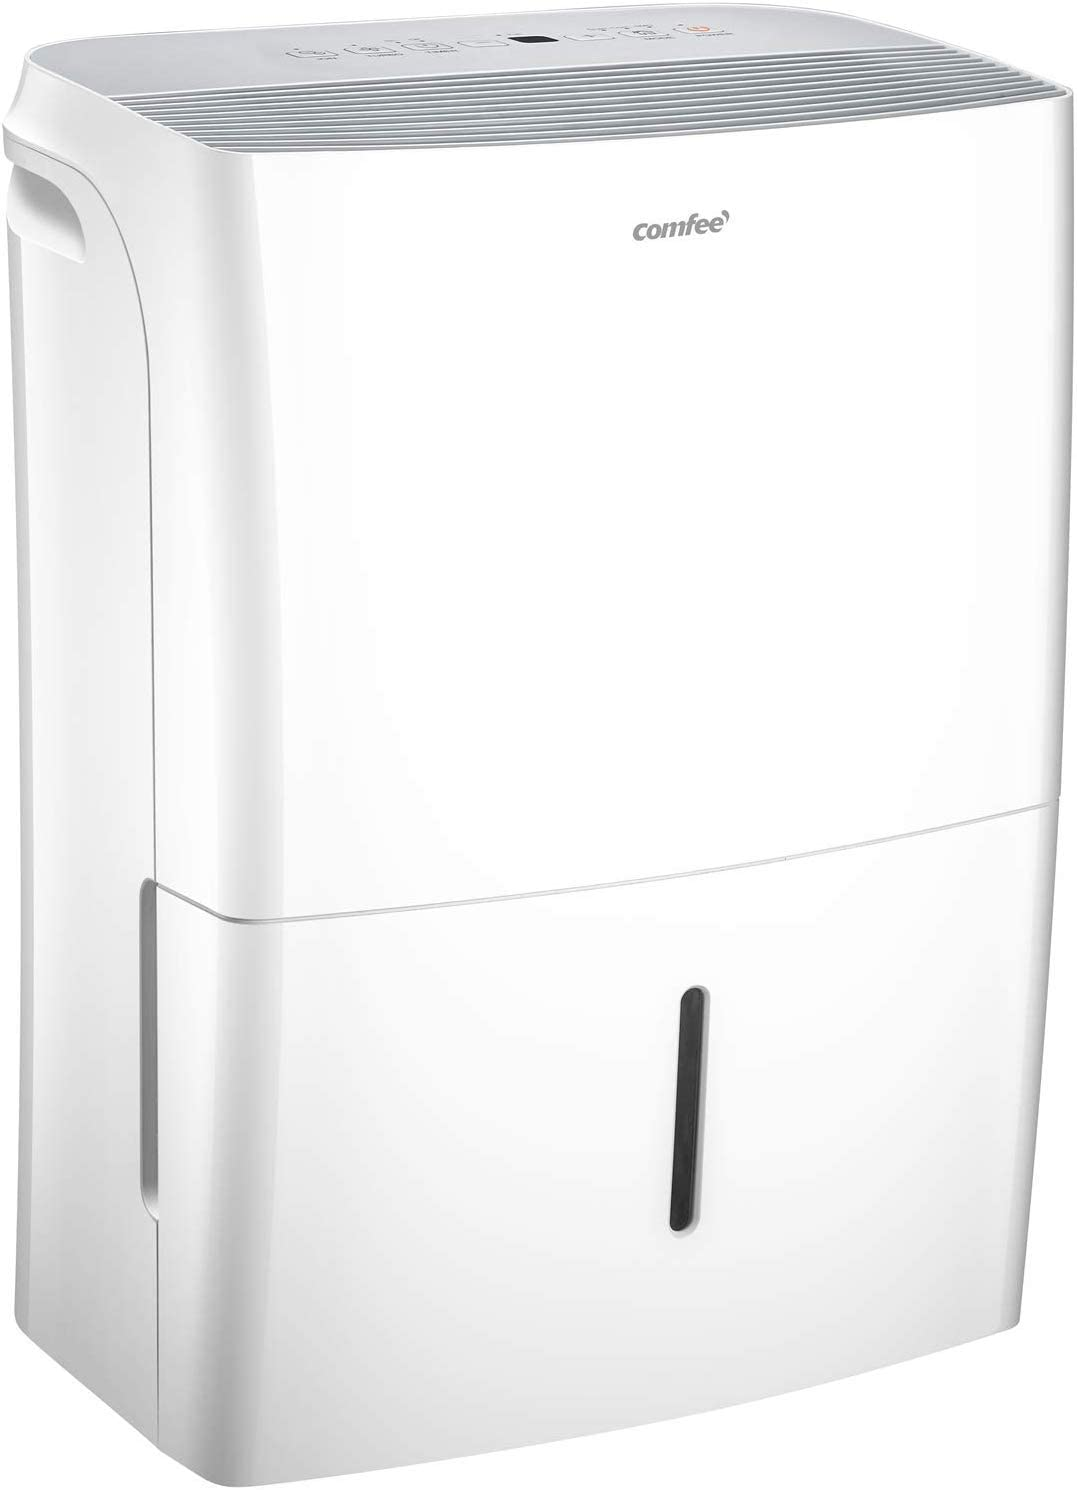 Luftentfeuchter Comfee MDDF-20DEN7-WF